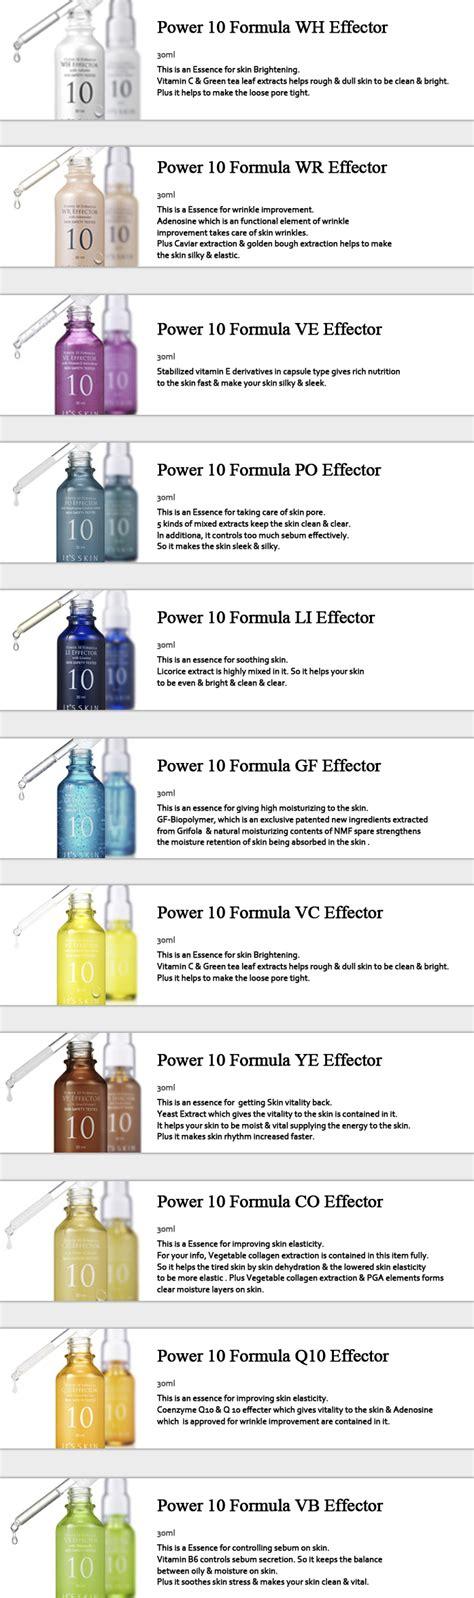 Its Skin Power 10 Formula Line Vc Effector Brightening Serum Essence it s skin power 10 formula wh effector 30ml oule